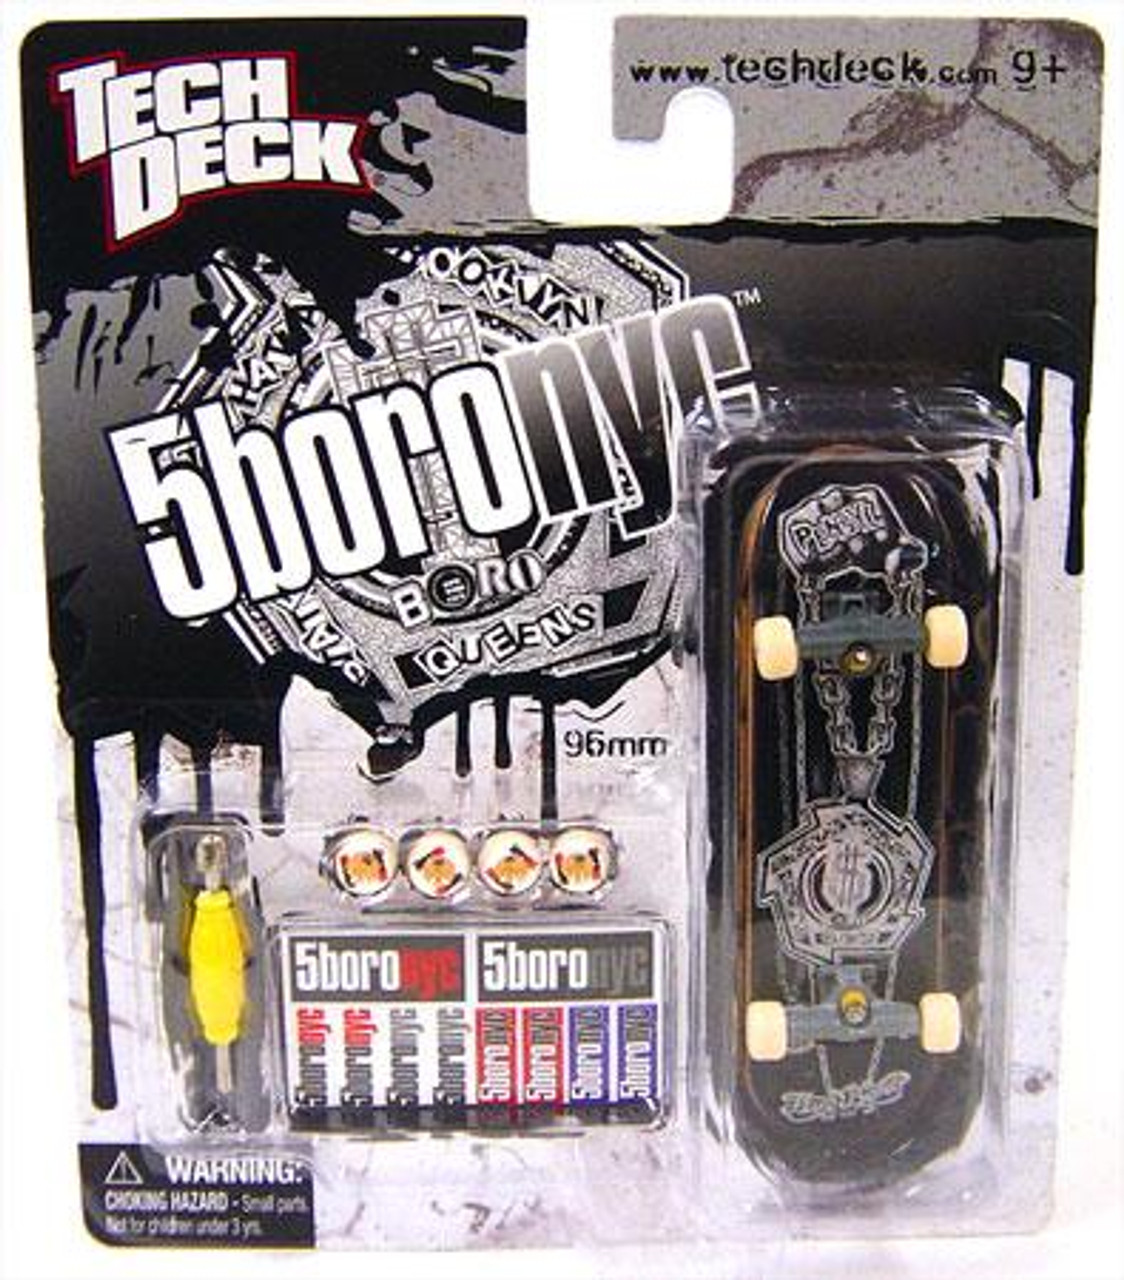 Tech Deck 5BoroNyc 96mm Mini Skateboard [Black]